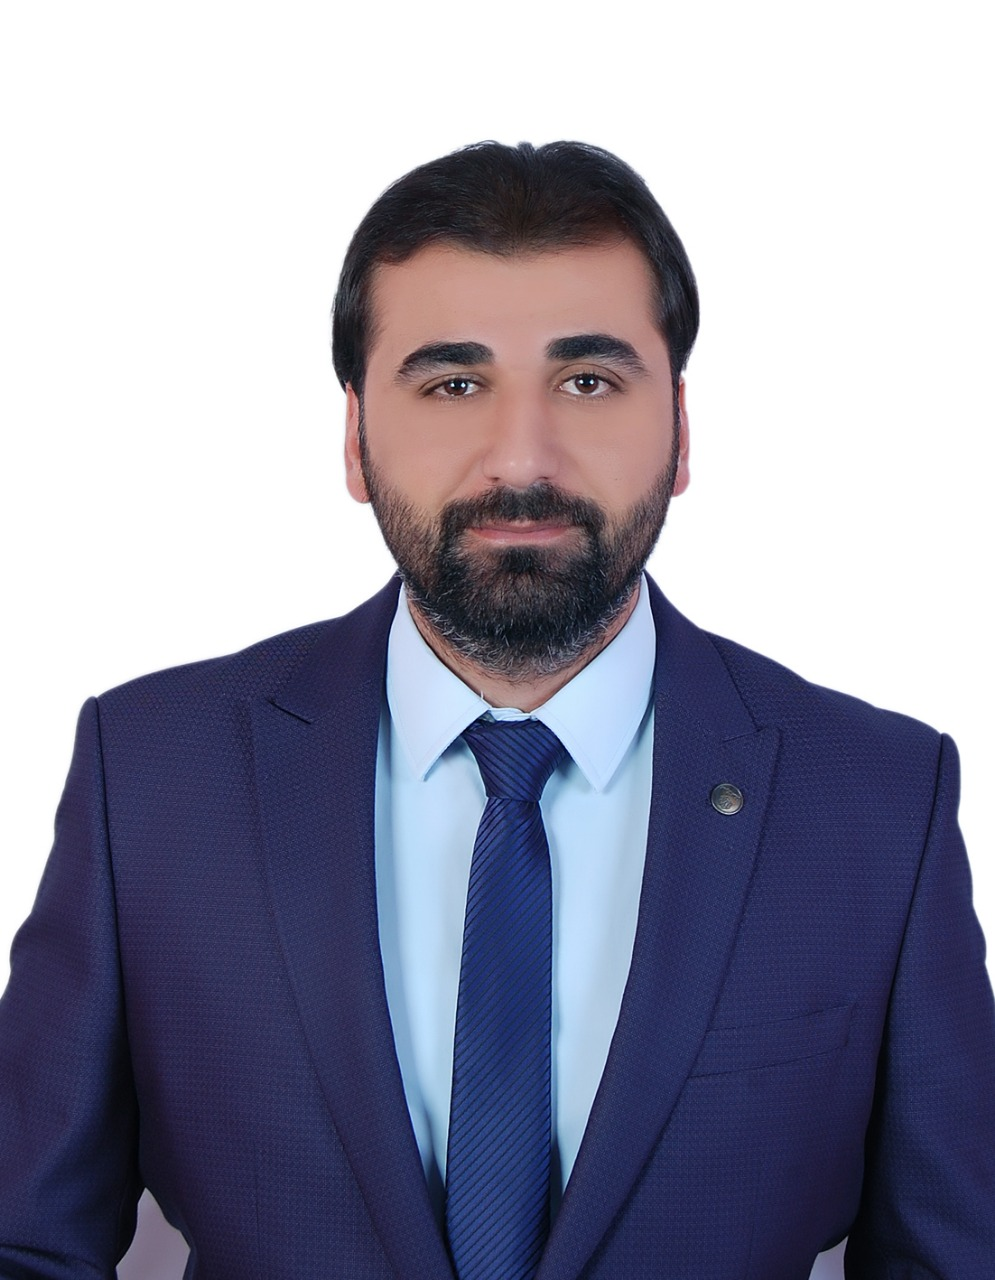 Mohamed Abdul Haq